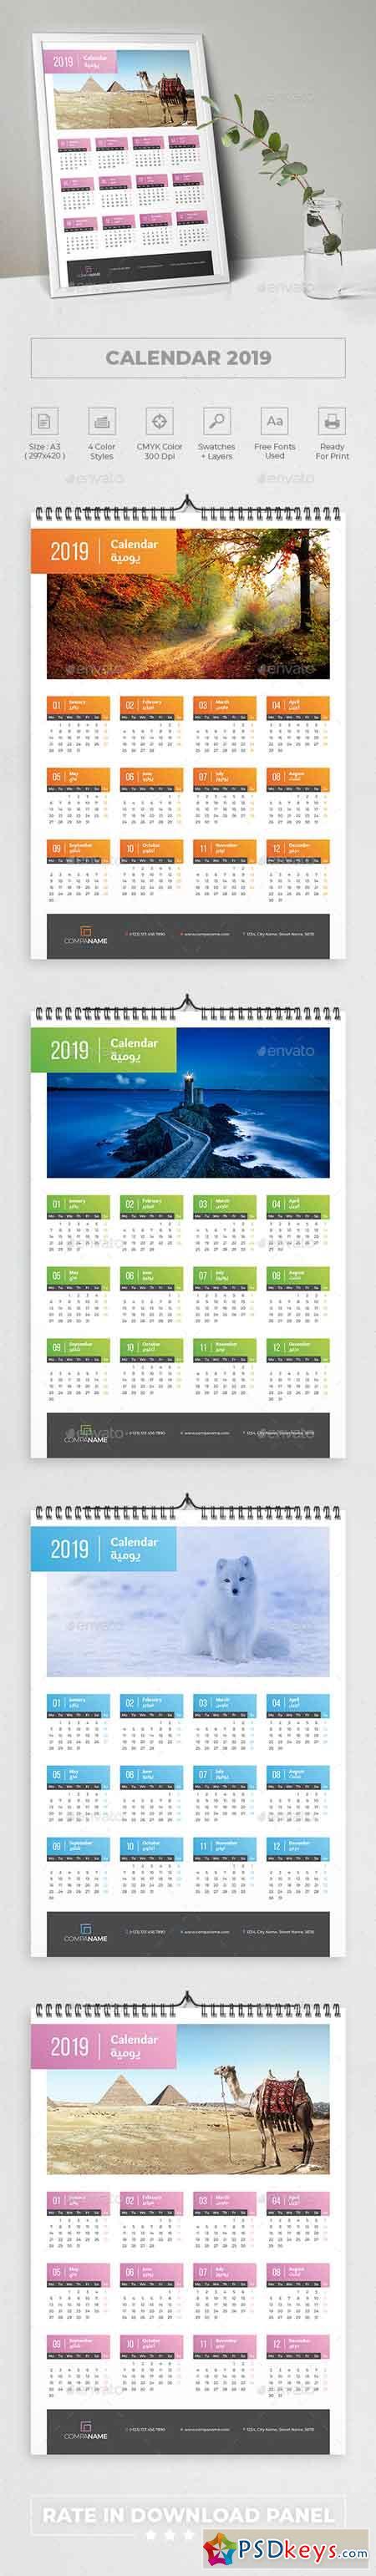 Calendar 2019 22893822